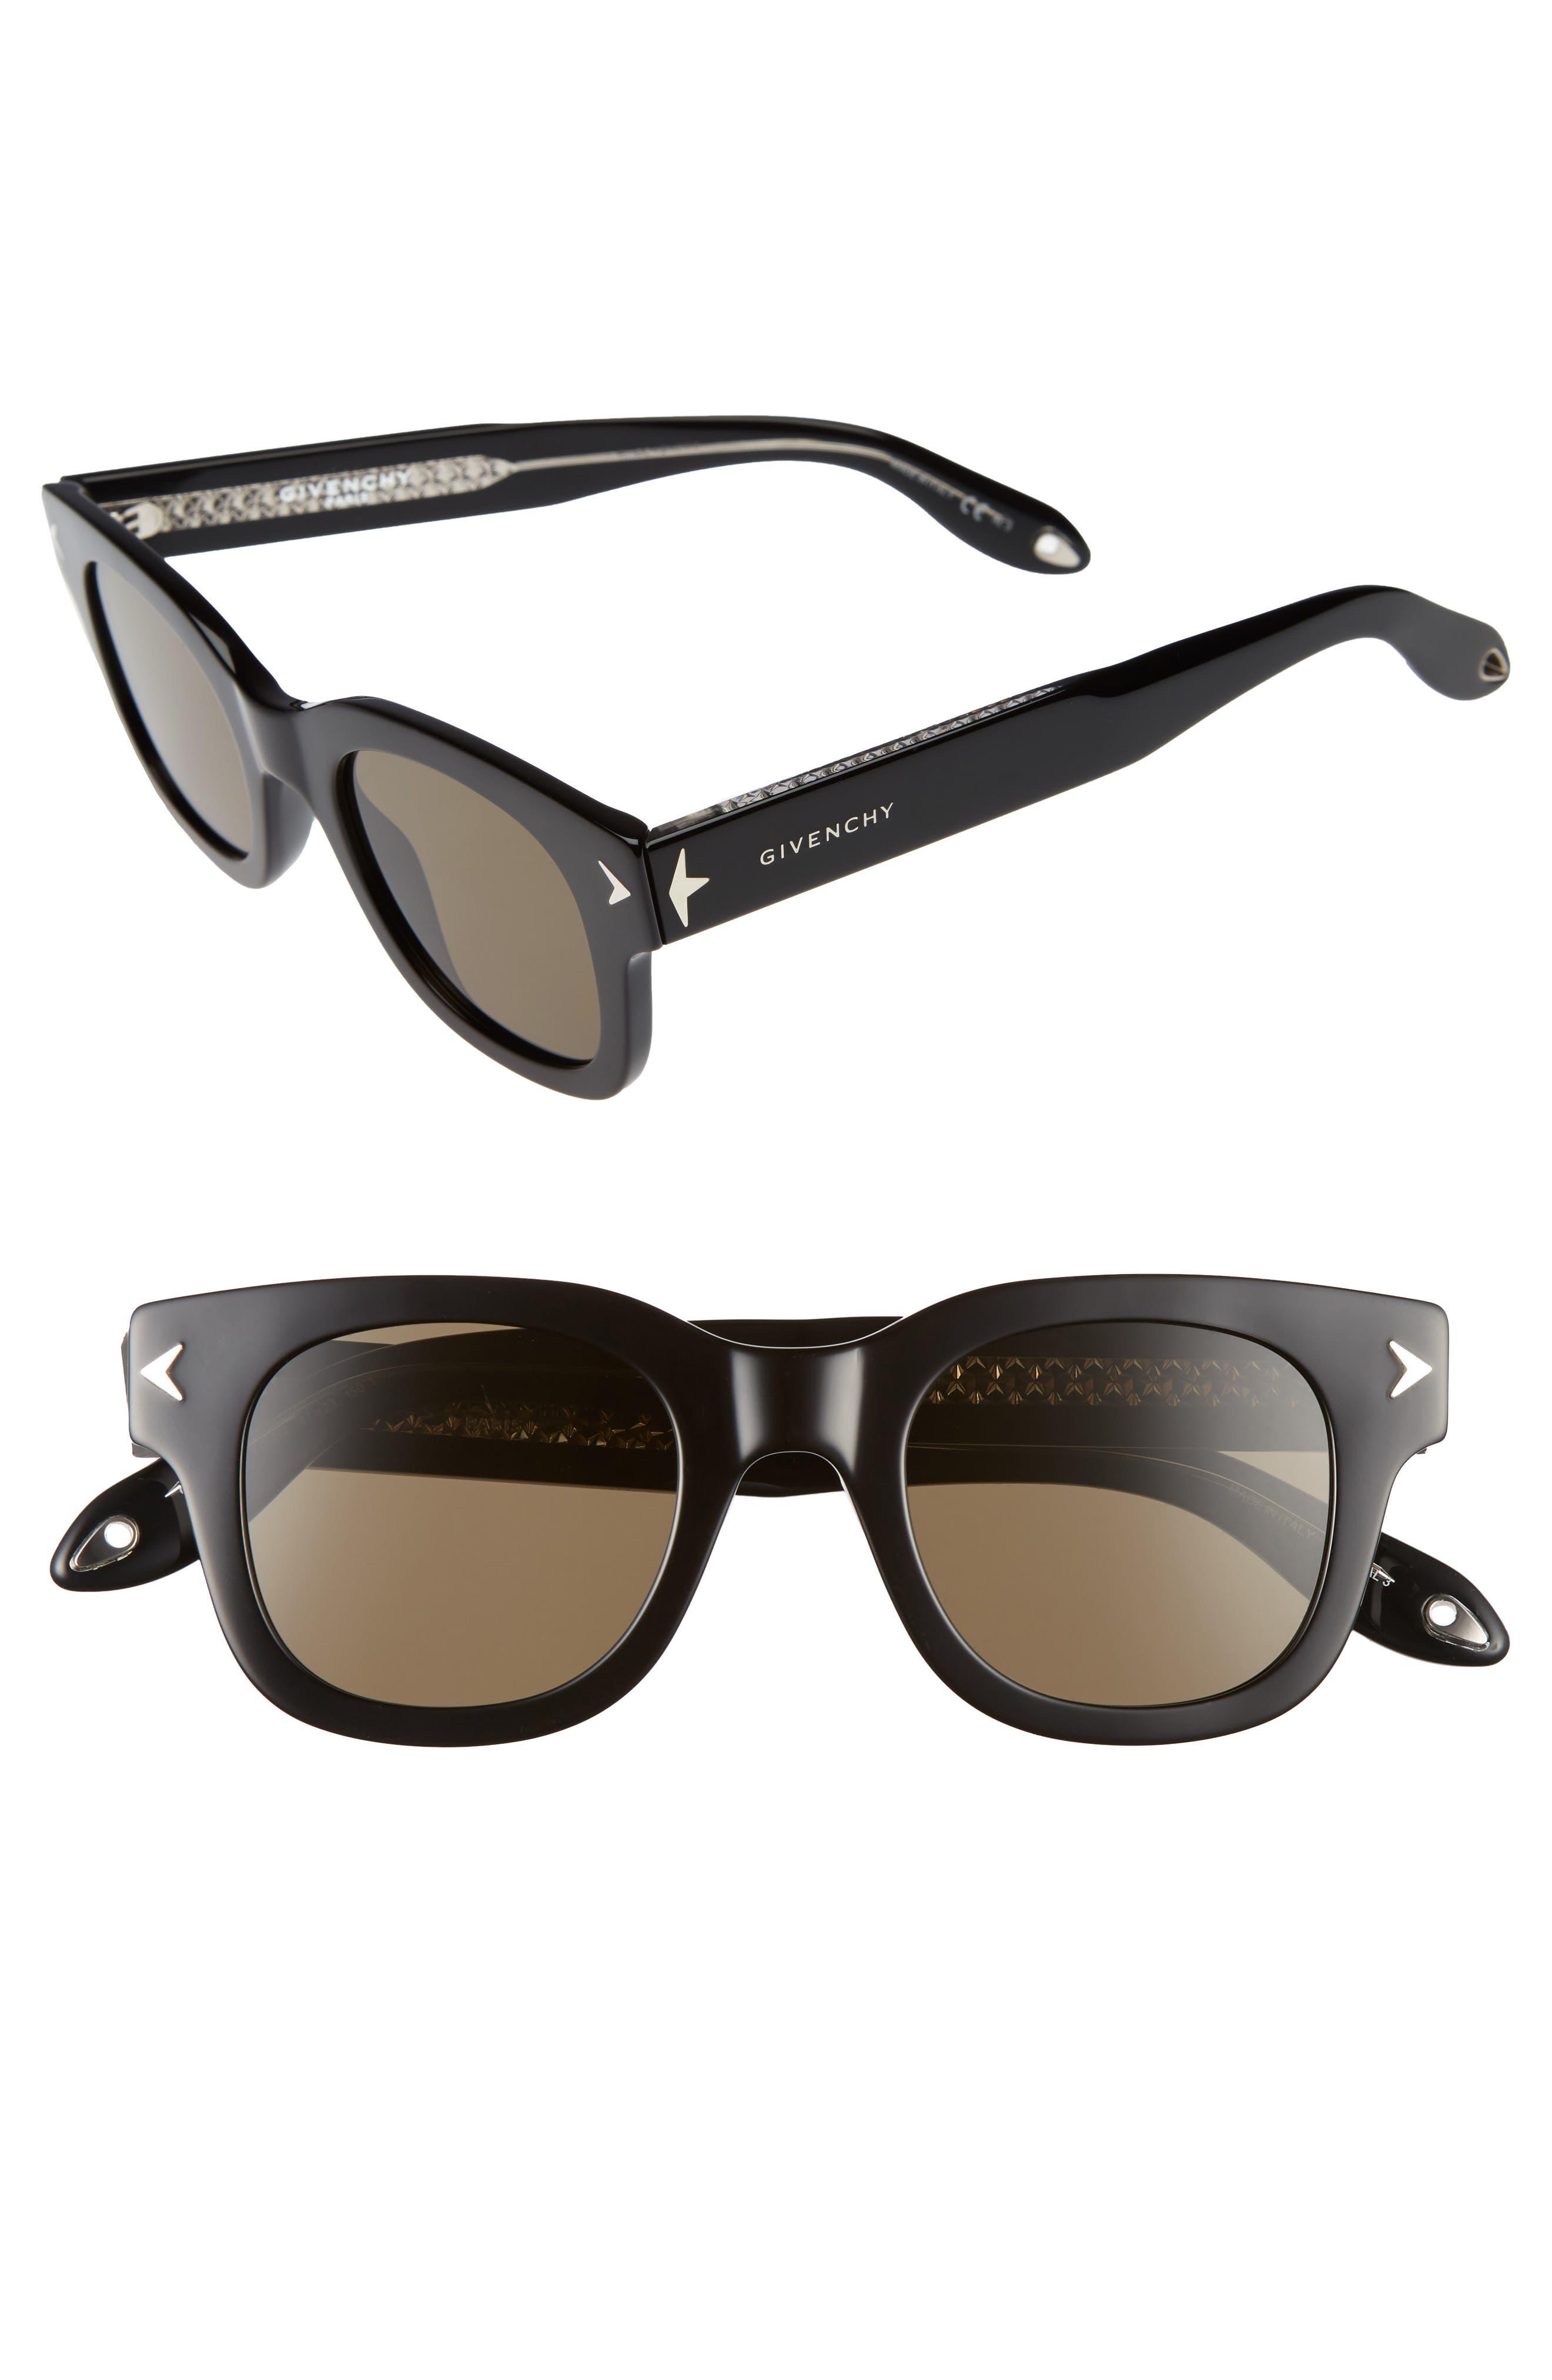 47mm Gradient Sunglasses,                             Alternate thumbnail 2, color,                             002